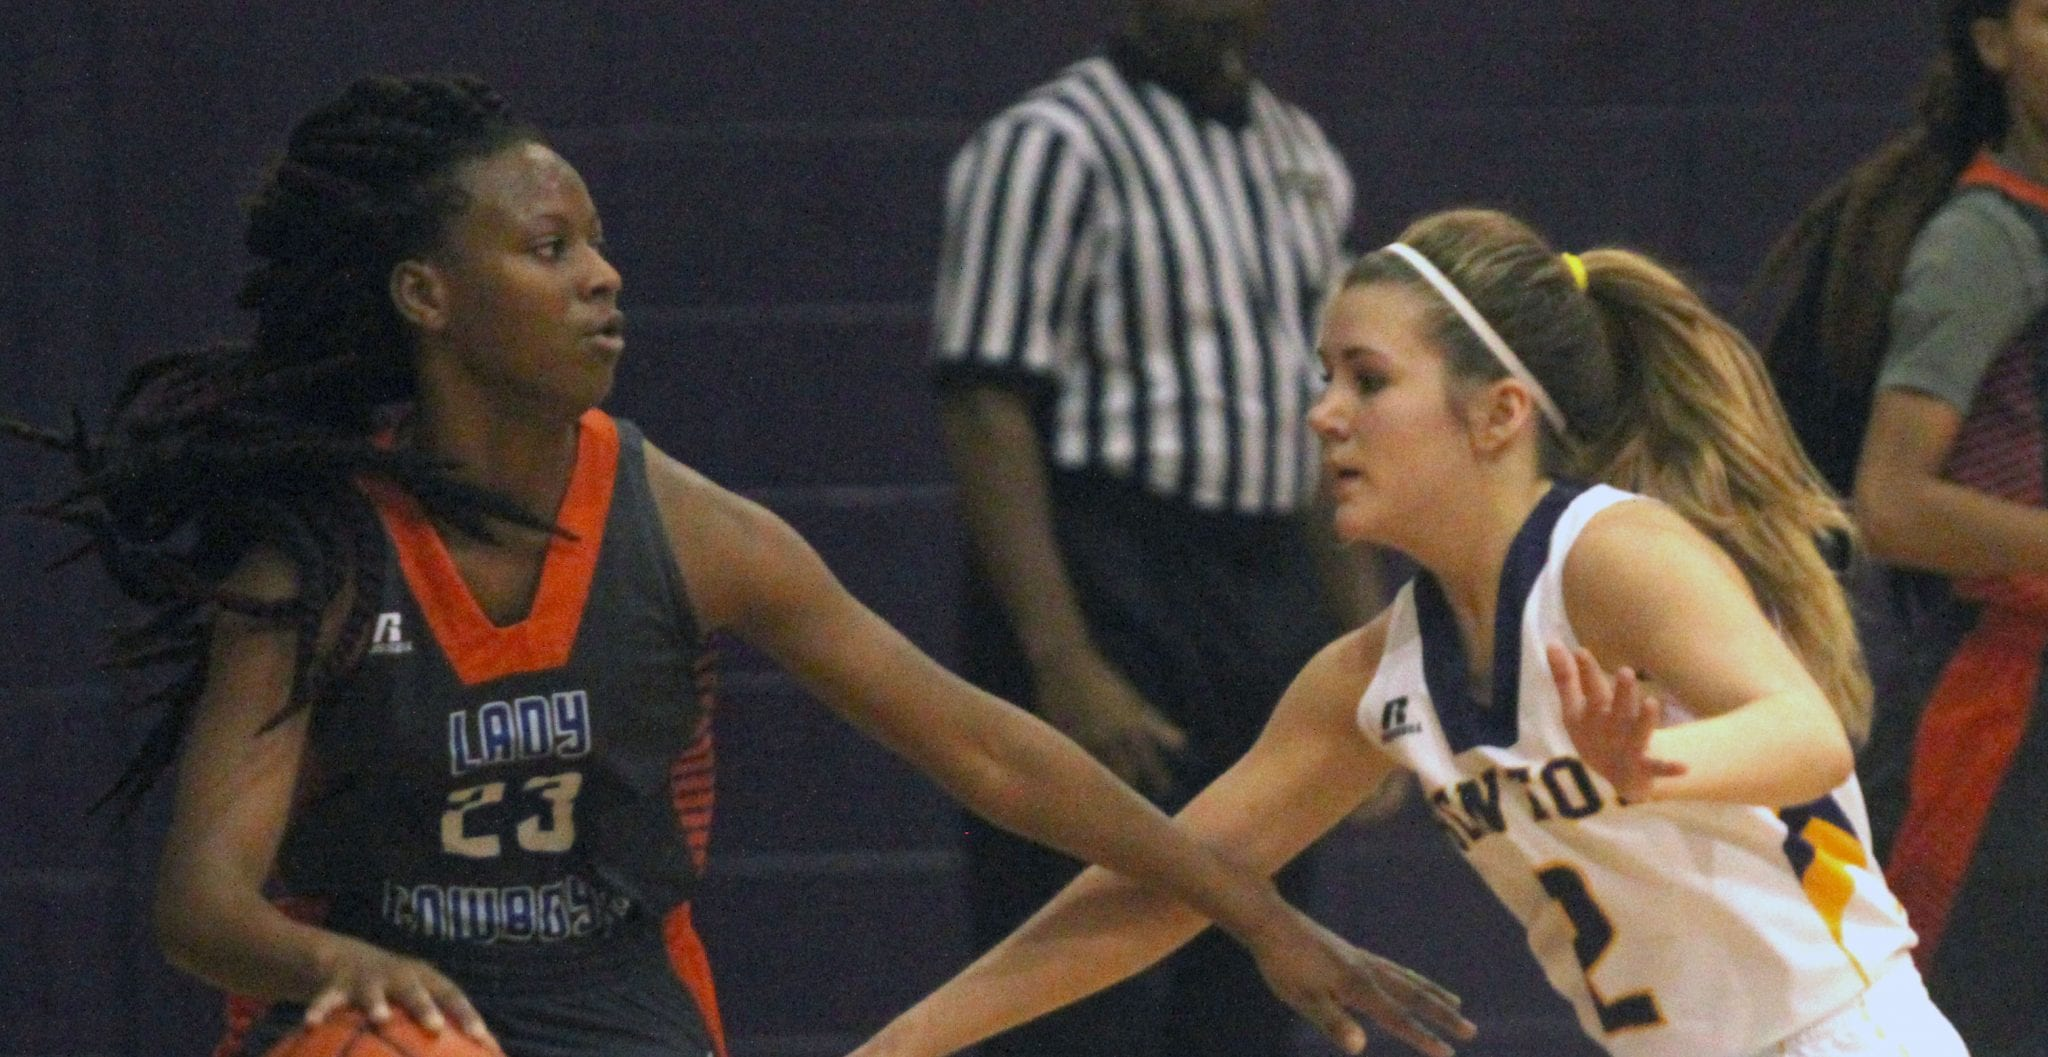 Girls basketball bossier wins doyline tournament benton - Basketball wallpapers for girls ...